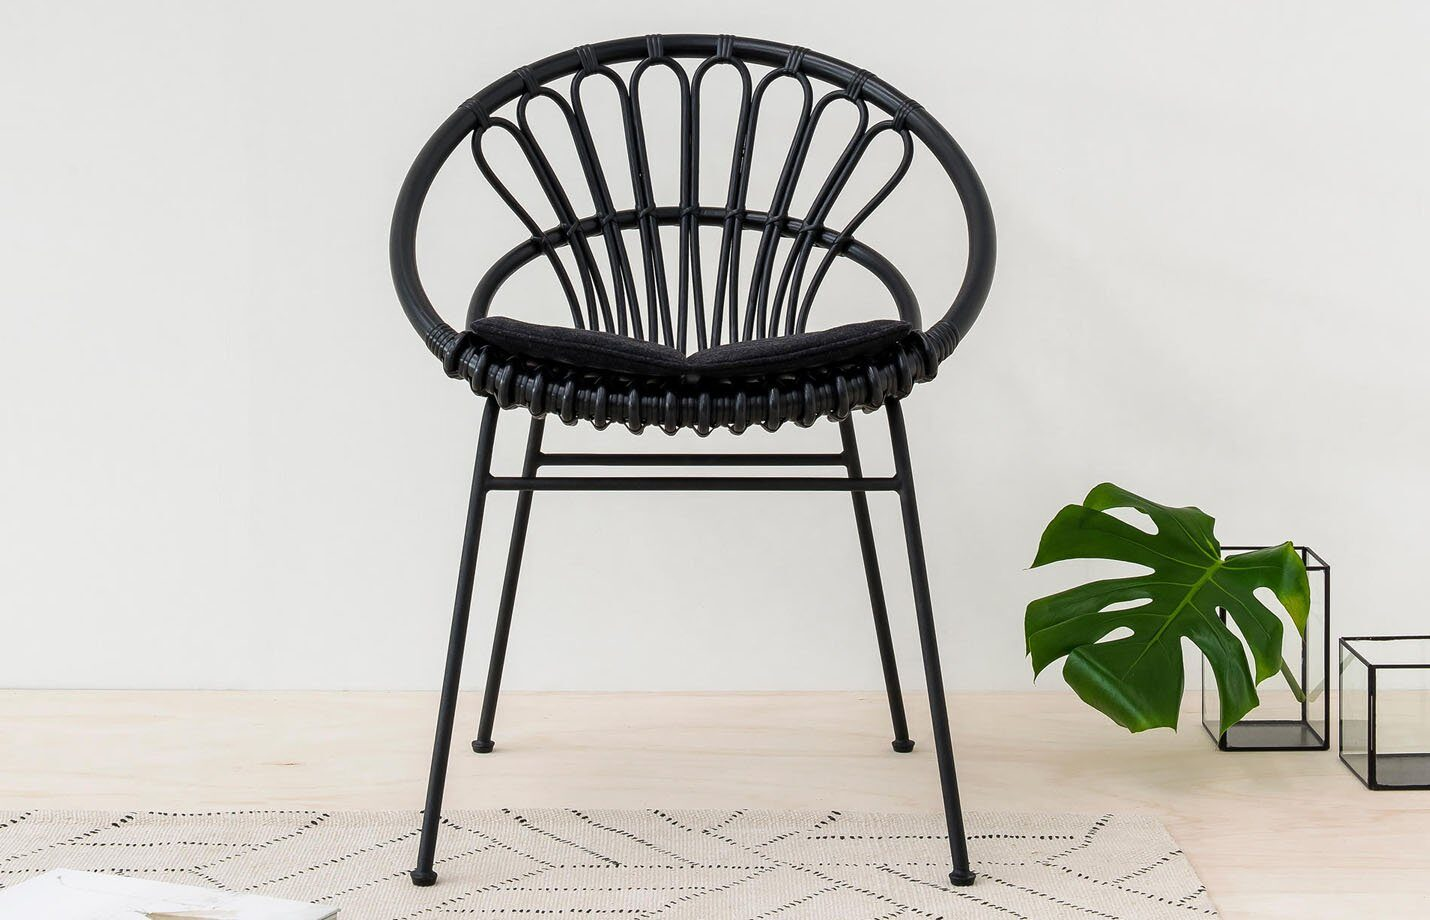 Cruz-Kiki-dining-chair-Rattan-with-metal-base-LS03